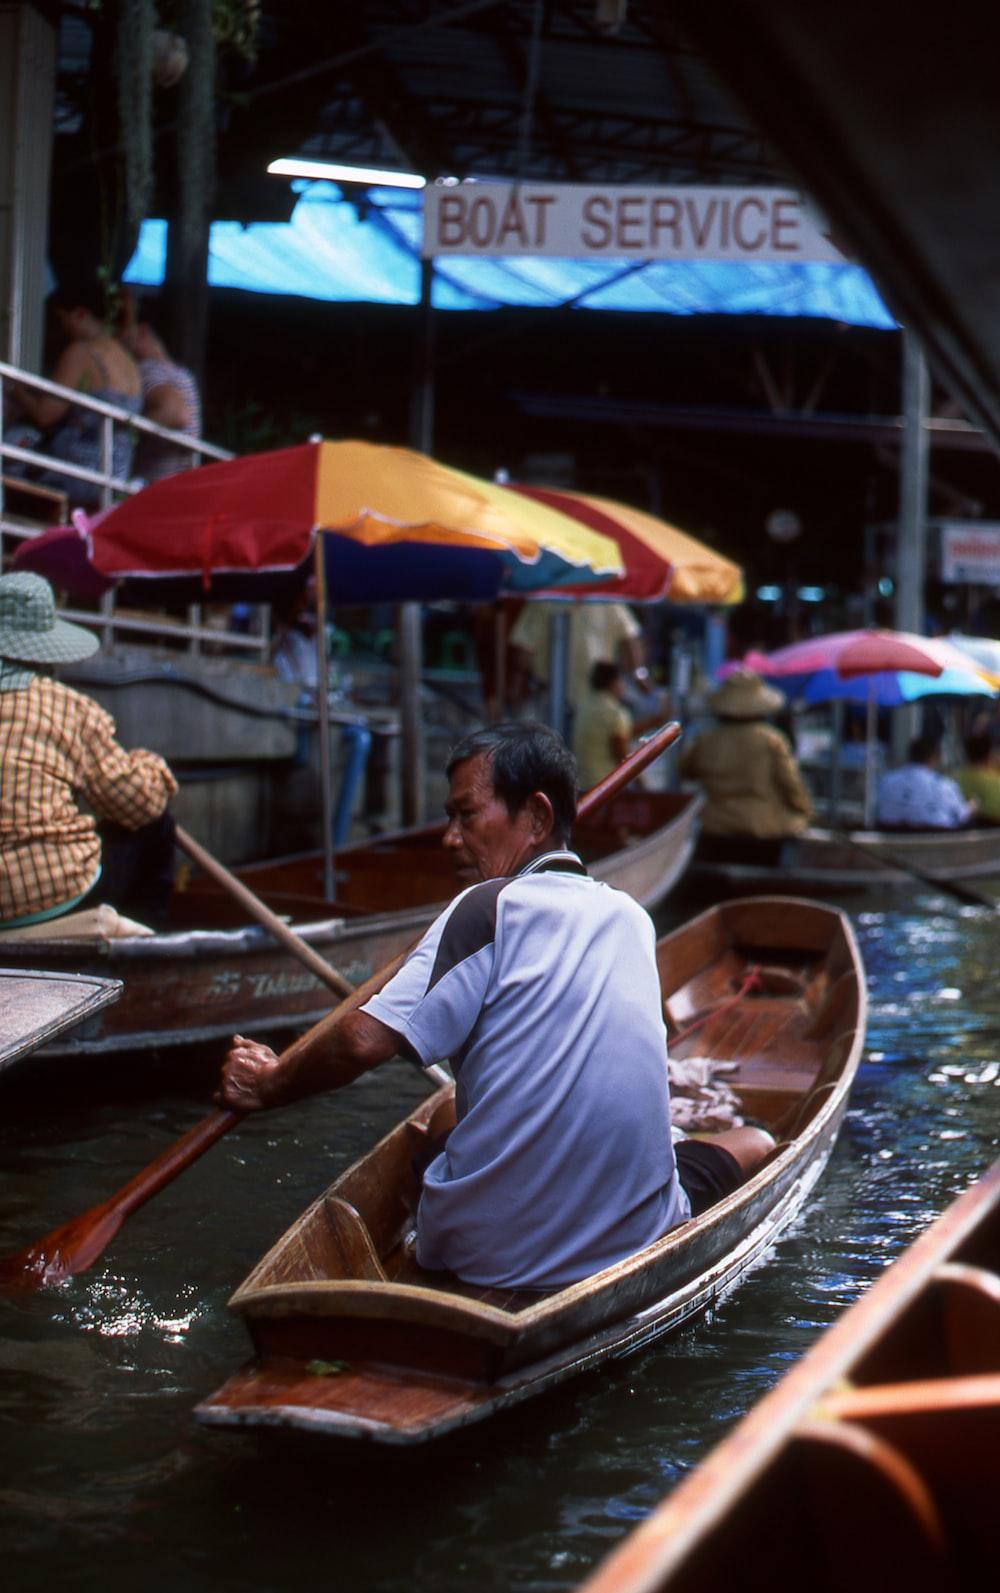 man wearing blue shirt riding on boat